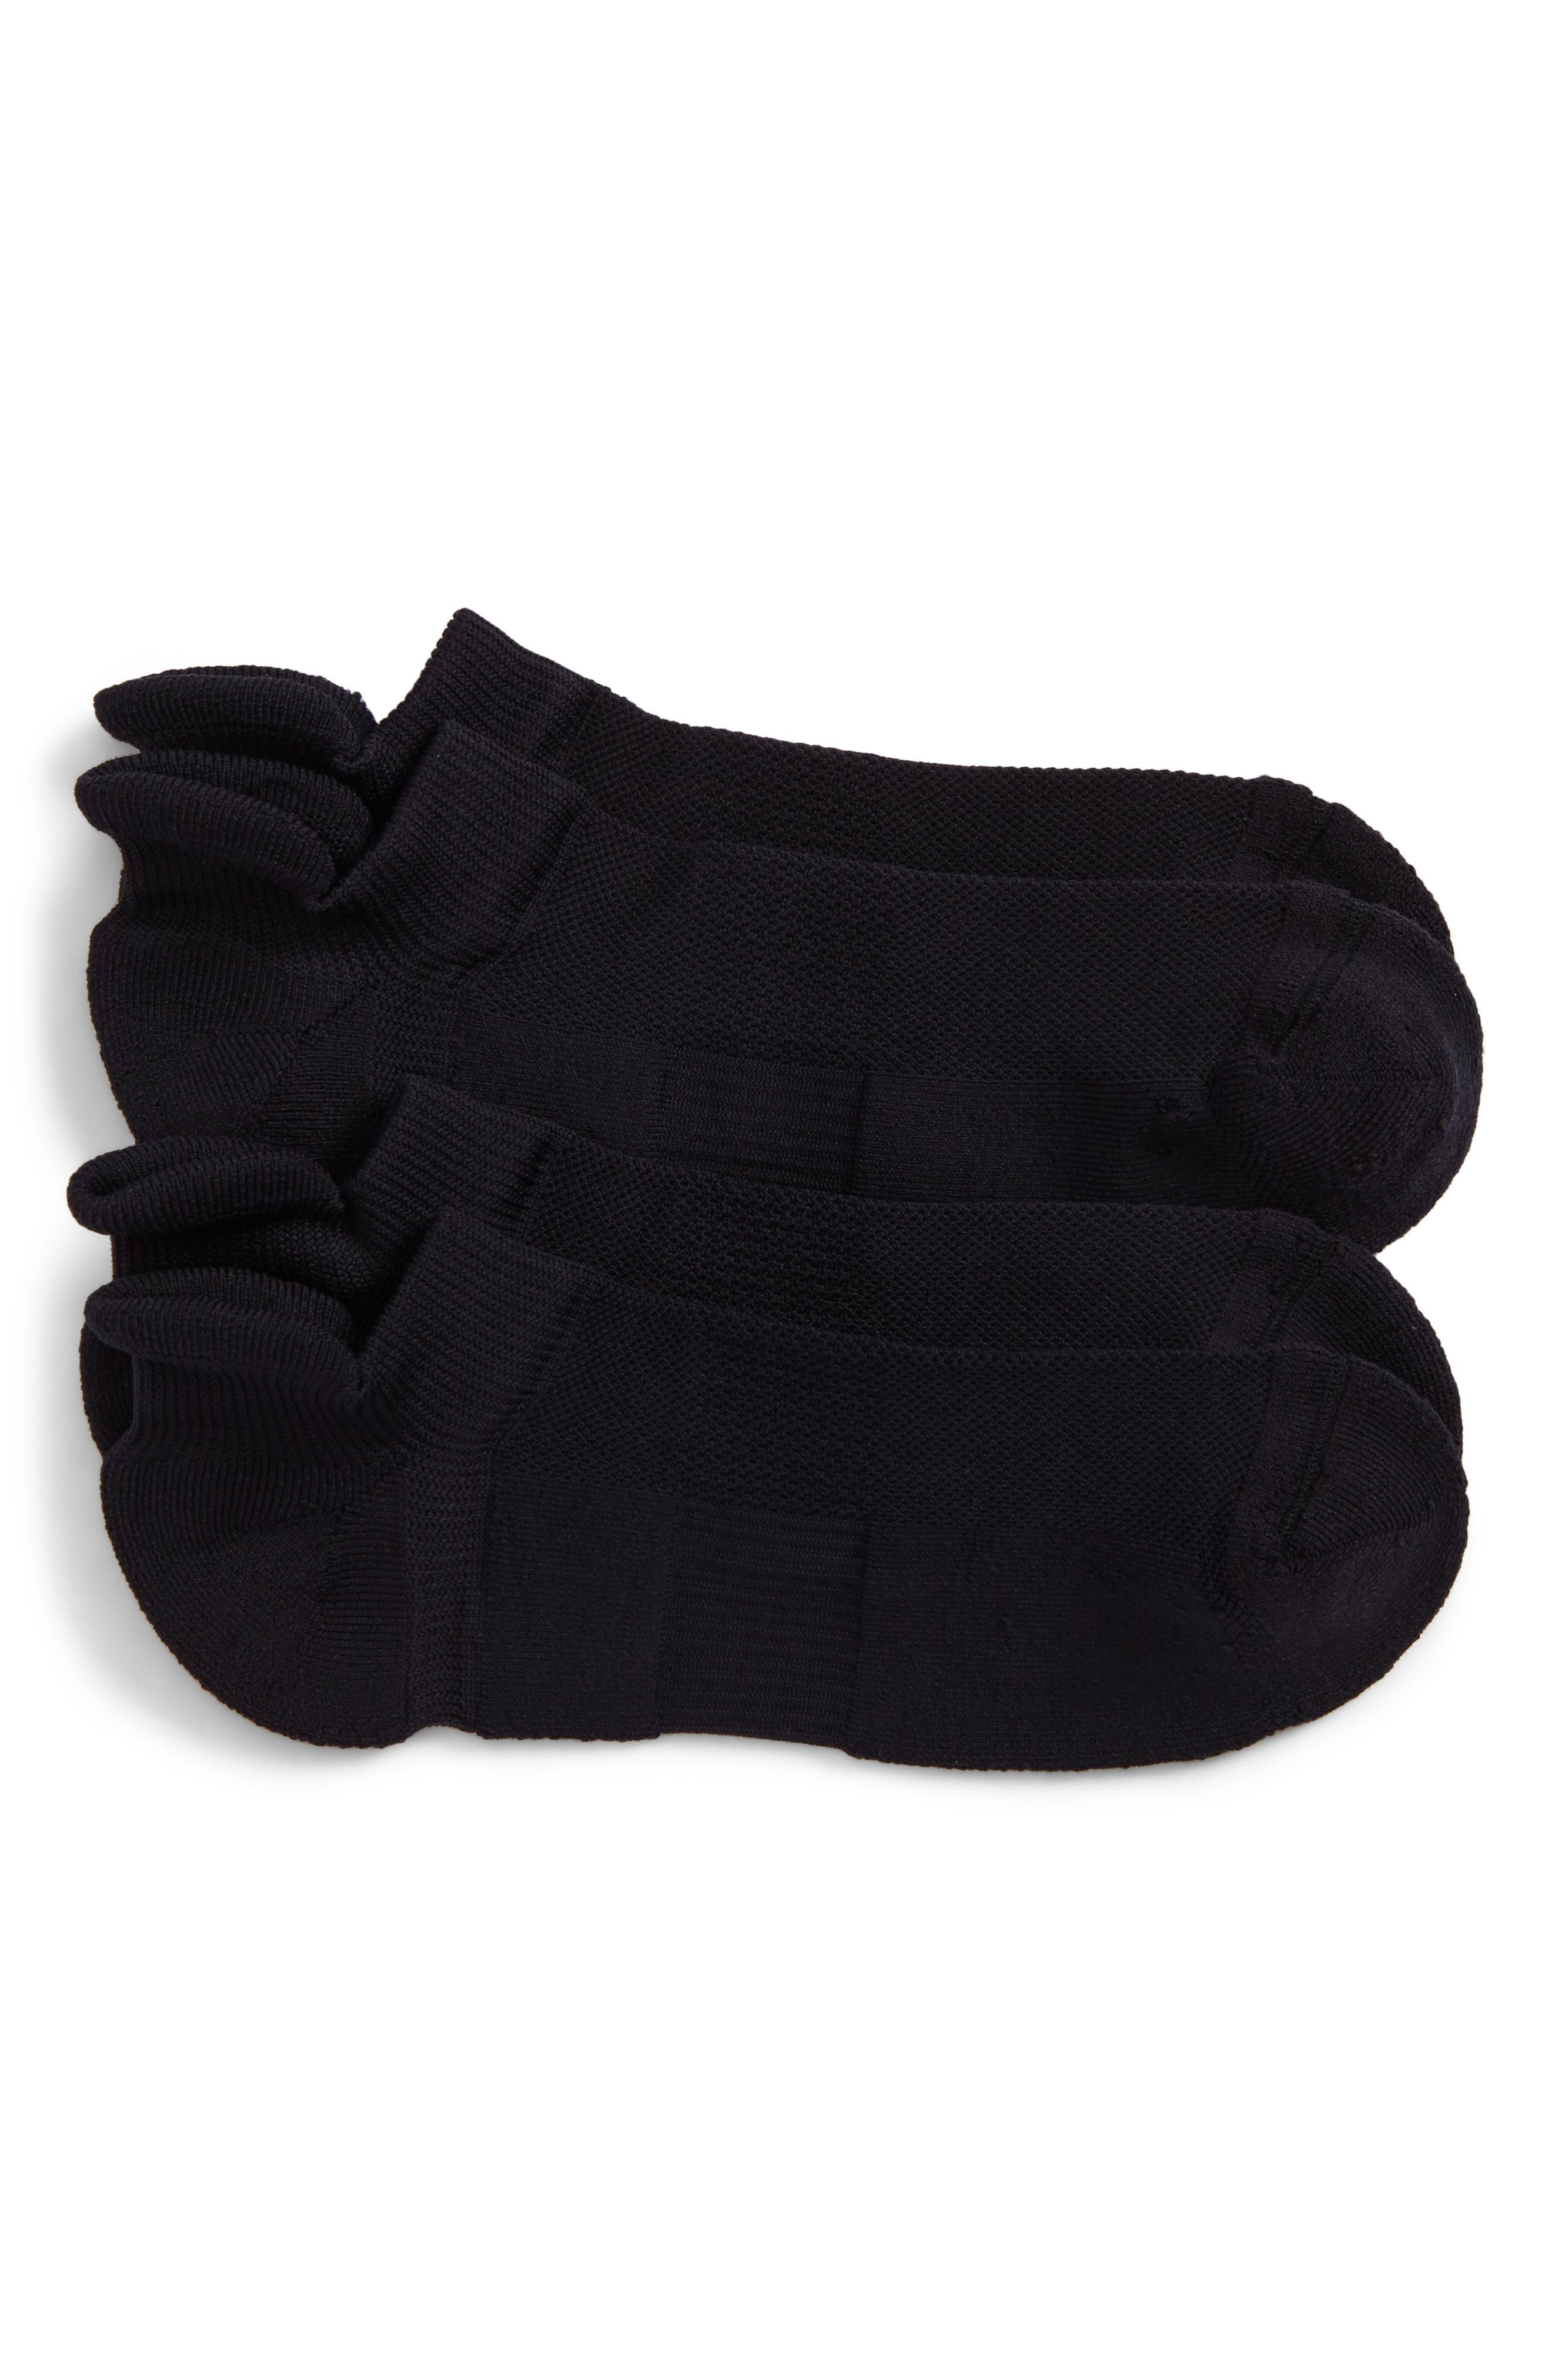 2-Pack Tech-Smart No-Show Socks,                             Main thumbnail 1, color,                             001